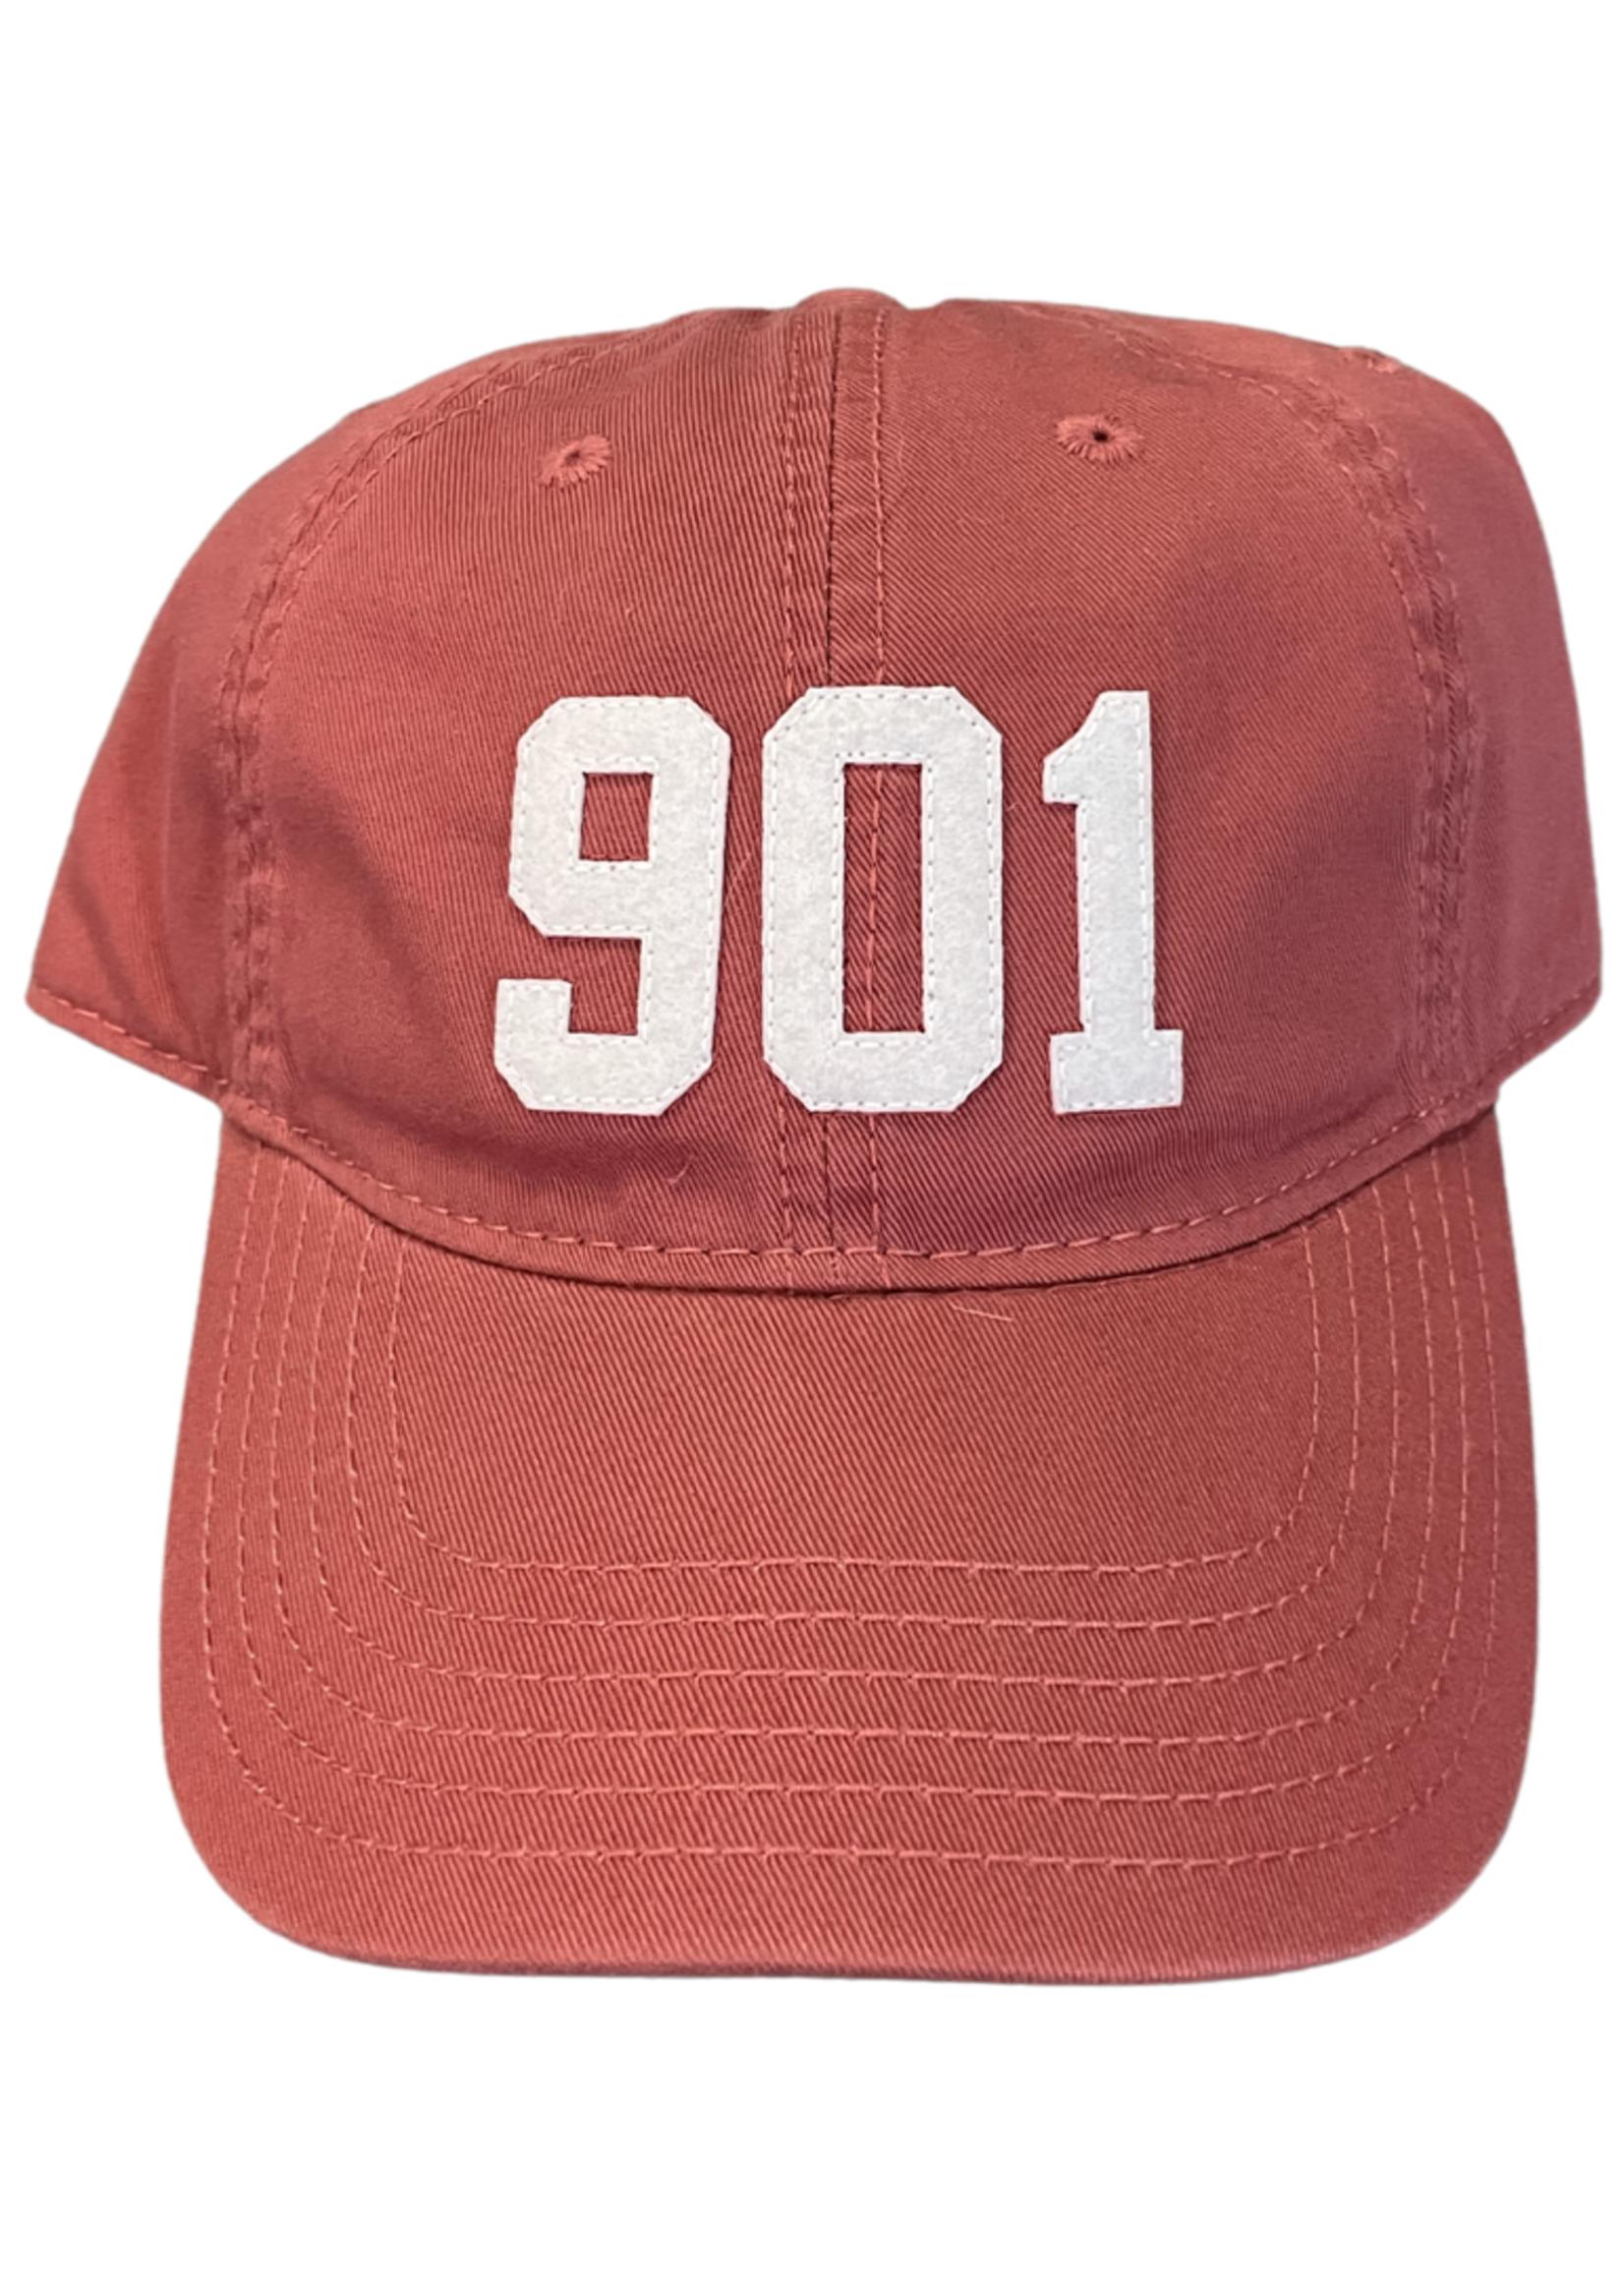 Oxbeau 901 Hat Nantucket Red